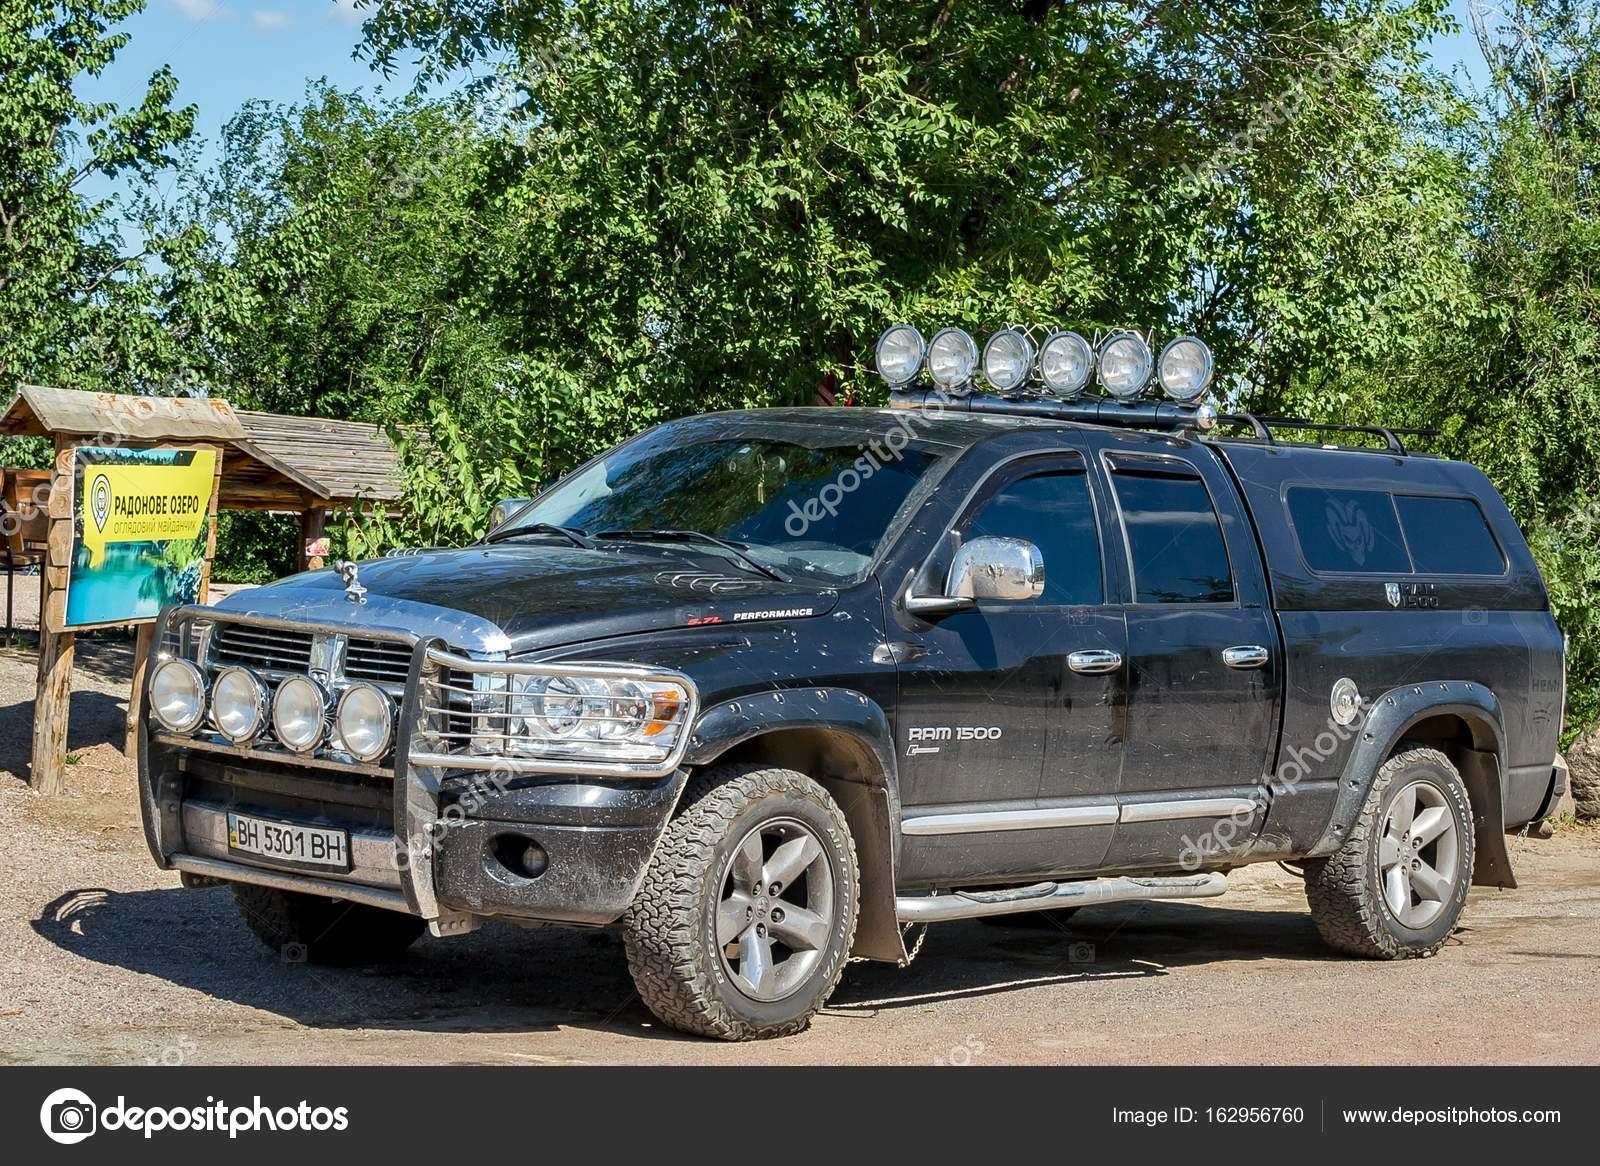 Imagenes Dodge Ram 2017 >> Imagenes Dodge Ram 2017 Ucrania Migea 30 De Julio De 2017